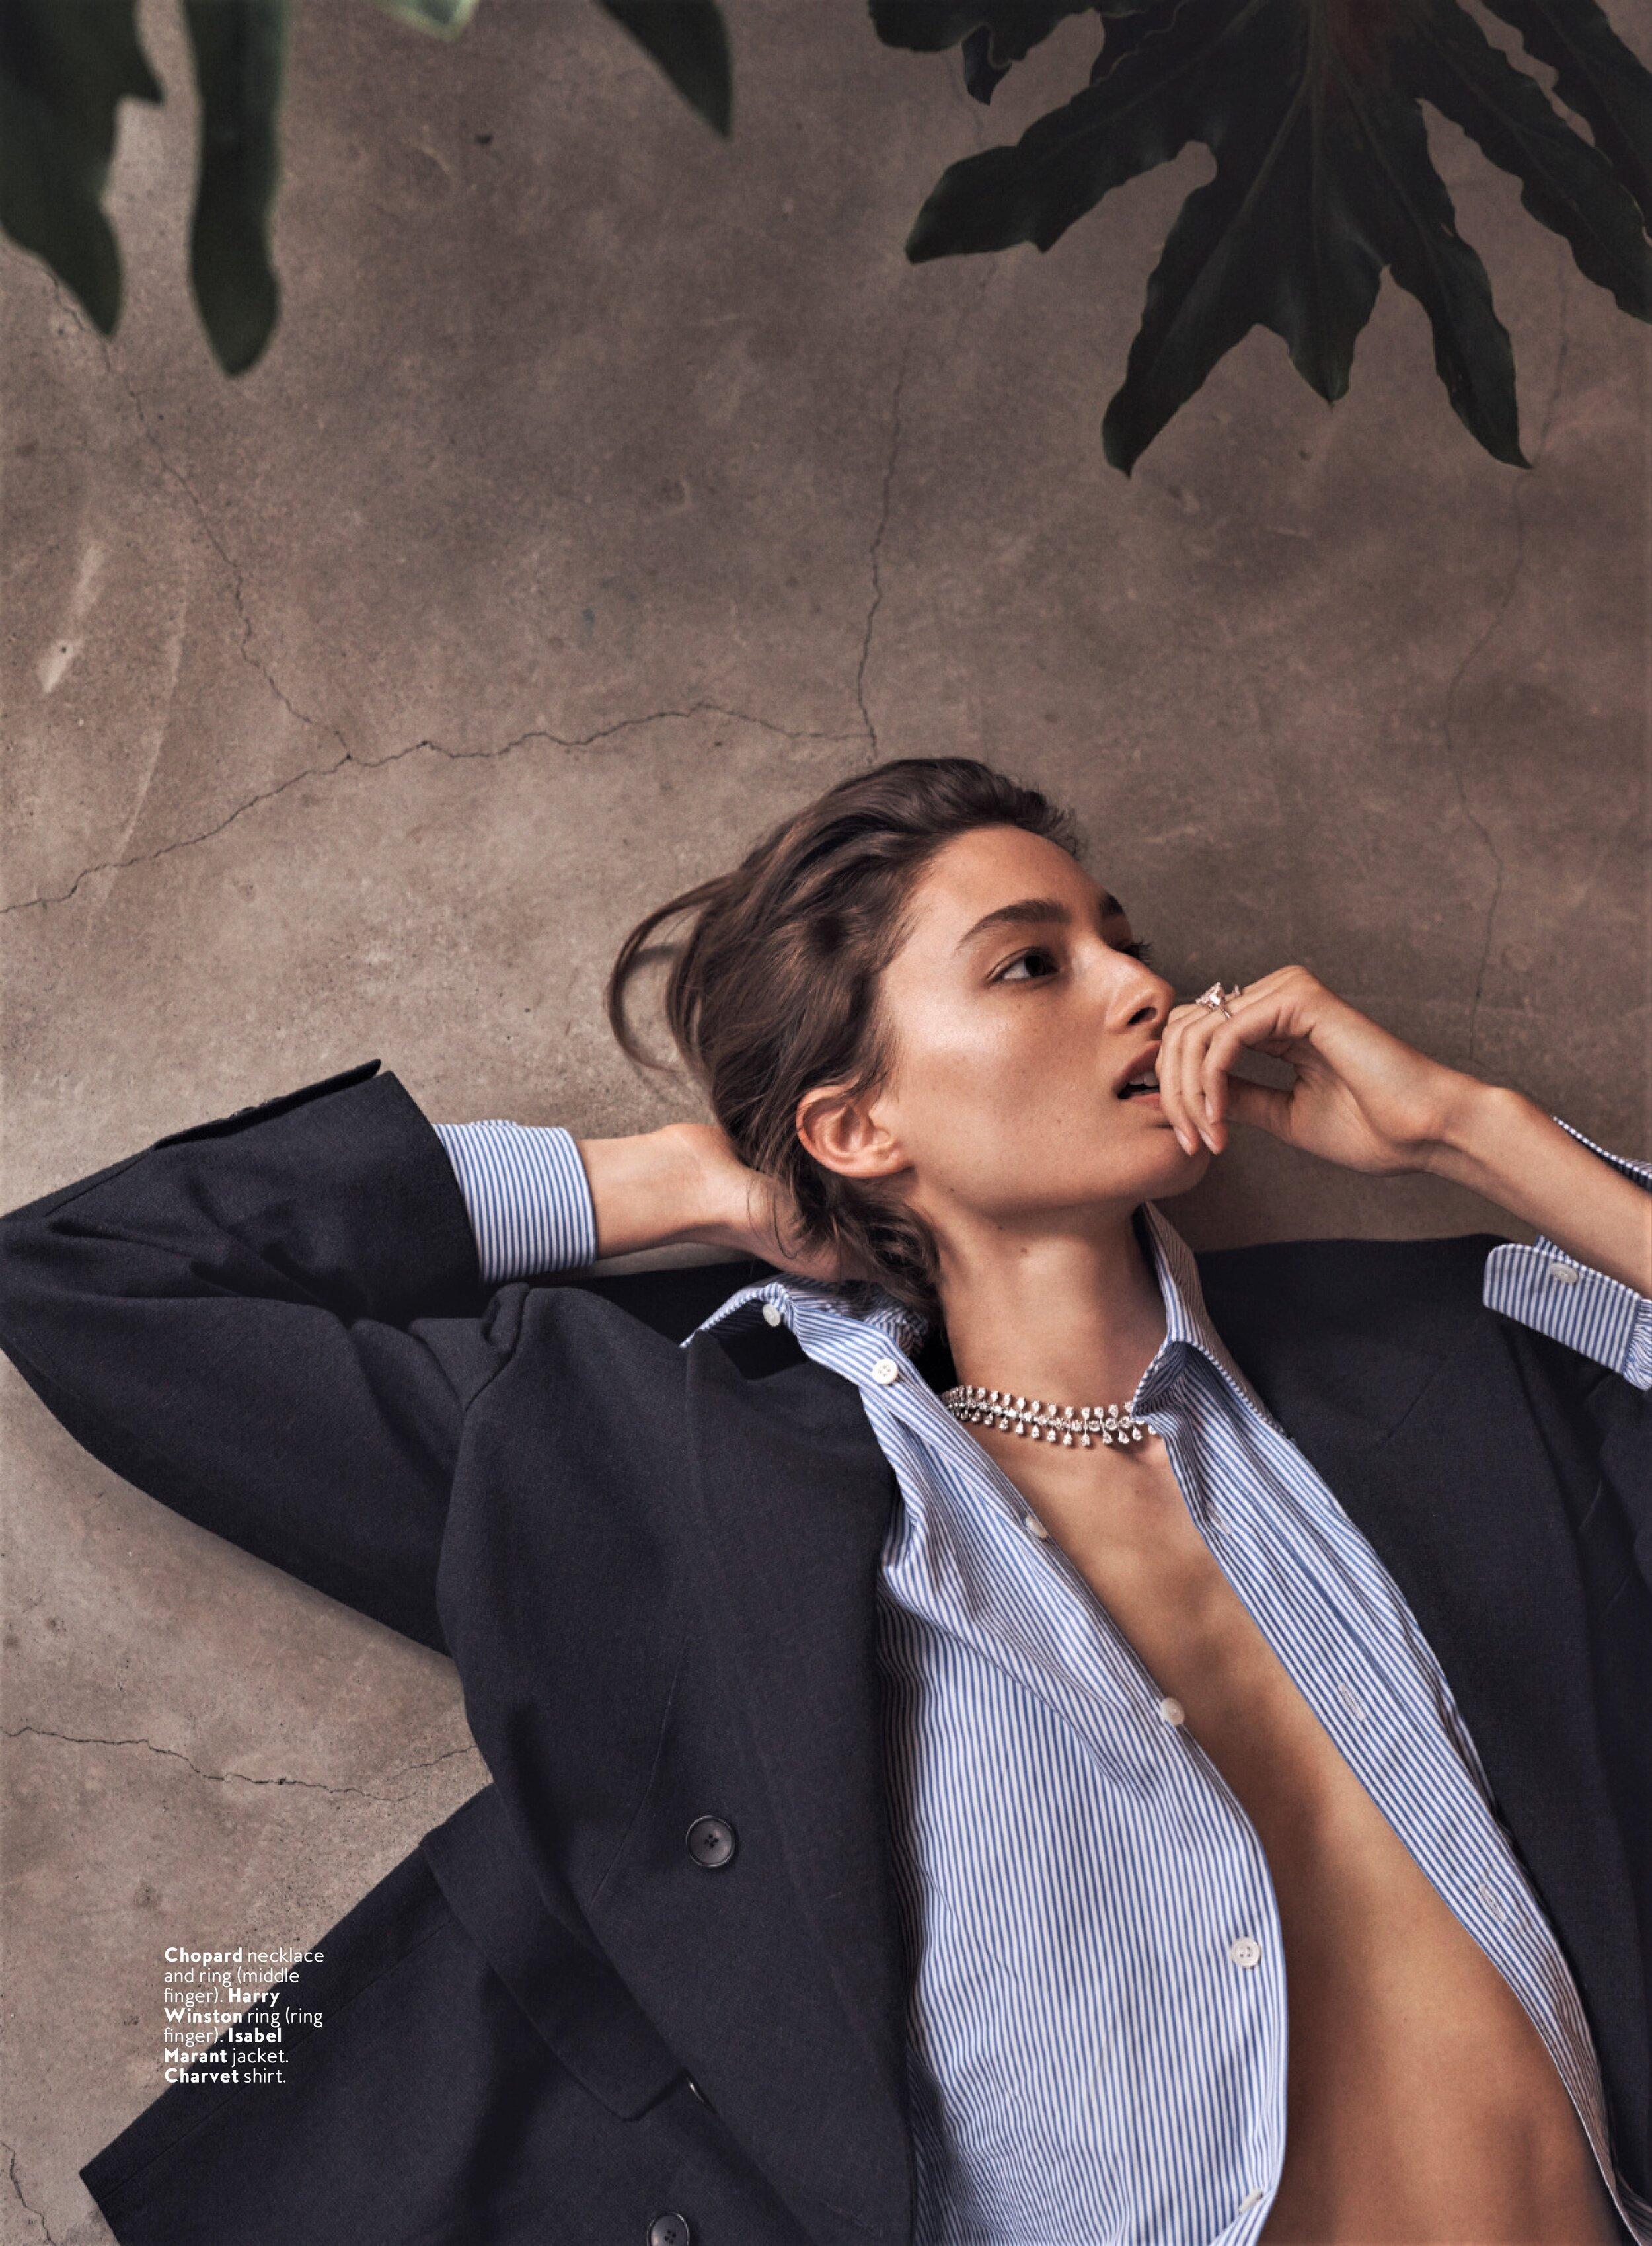 Alexandra Agoston by Steven Pan for InStyle Oct 2019 (4).jpg